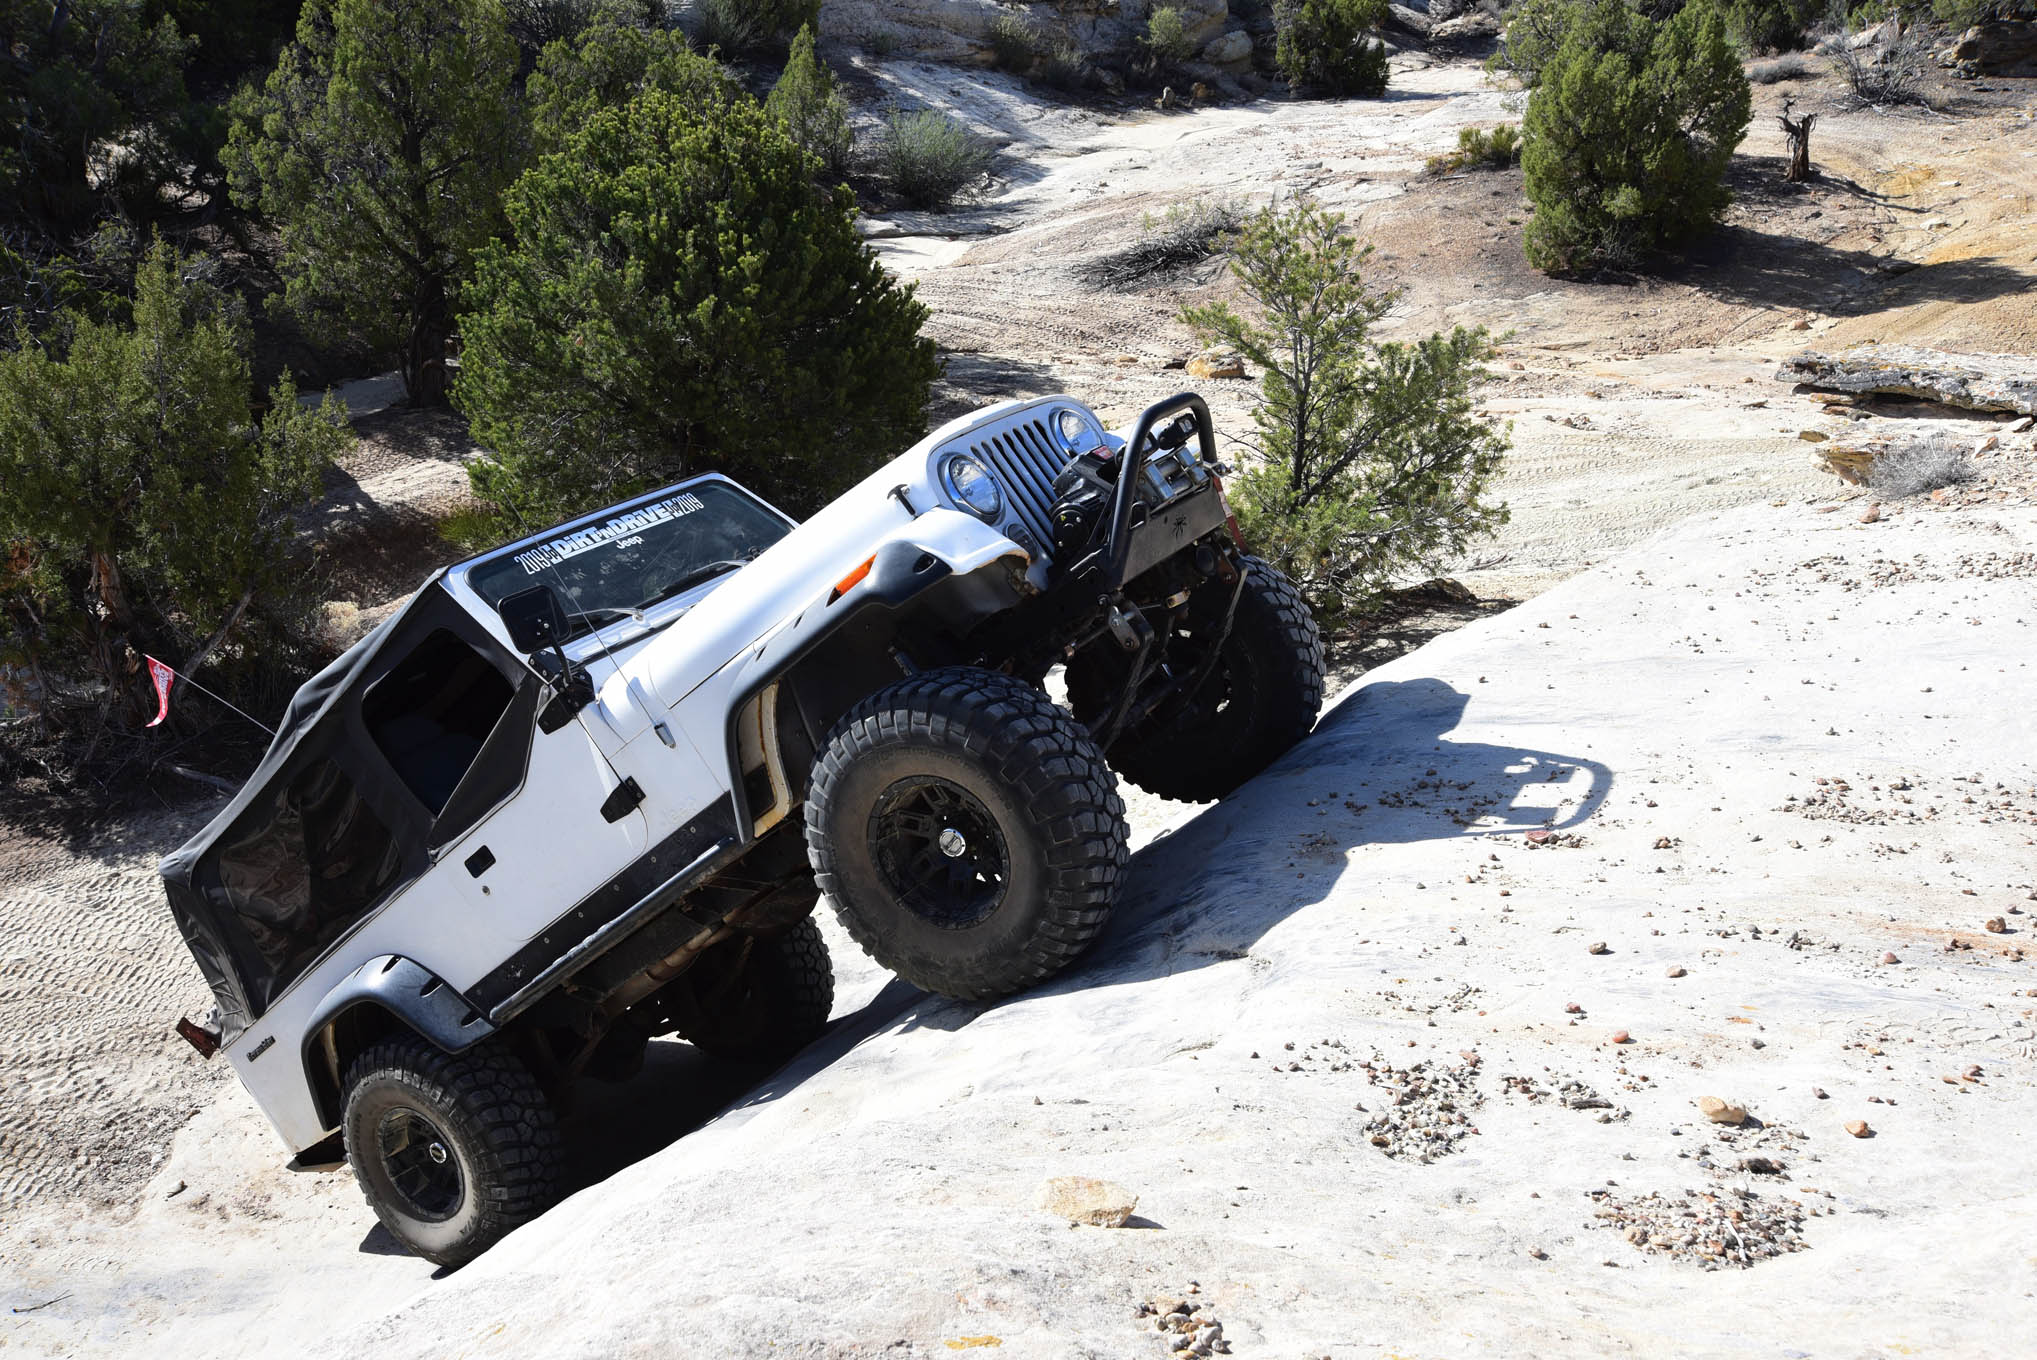 022 jeep 1984 scrambler cj8 cj 8 jp magazine stuart bourdon aaron paris